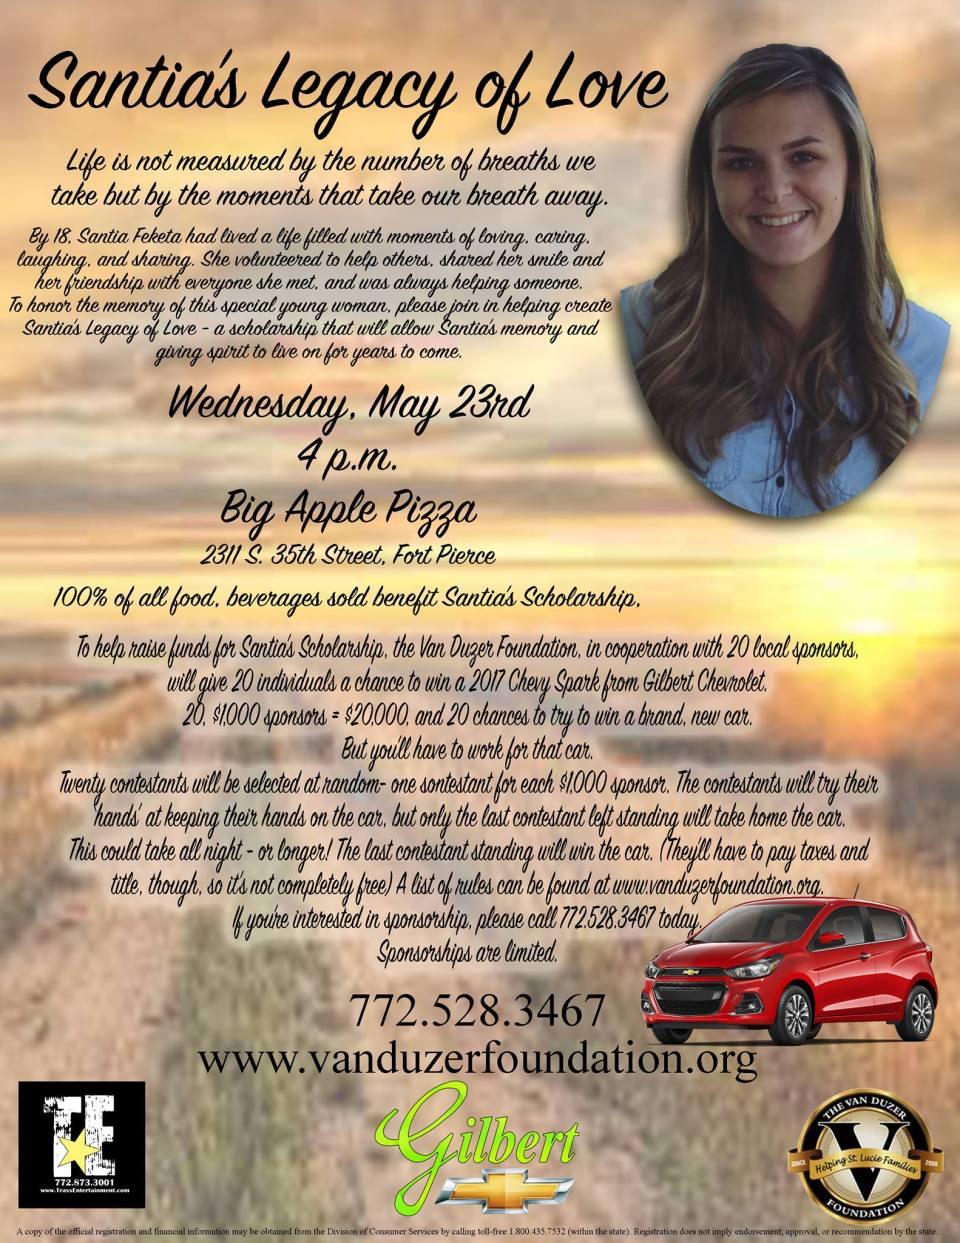 Fundraiser honors life of teen killed in wrong-way crash